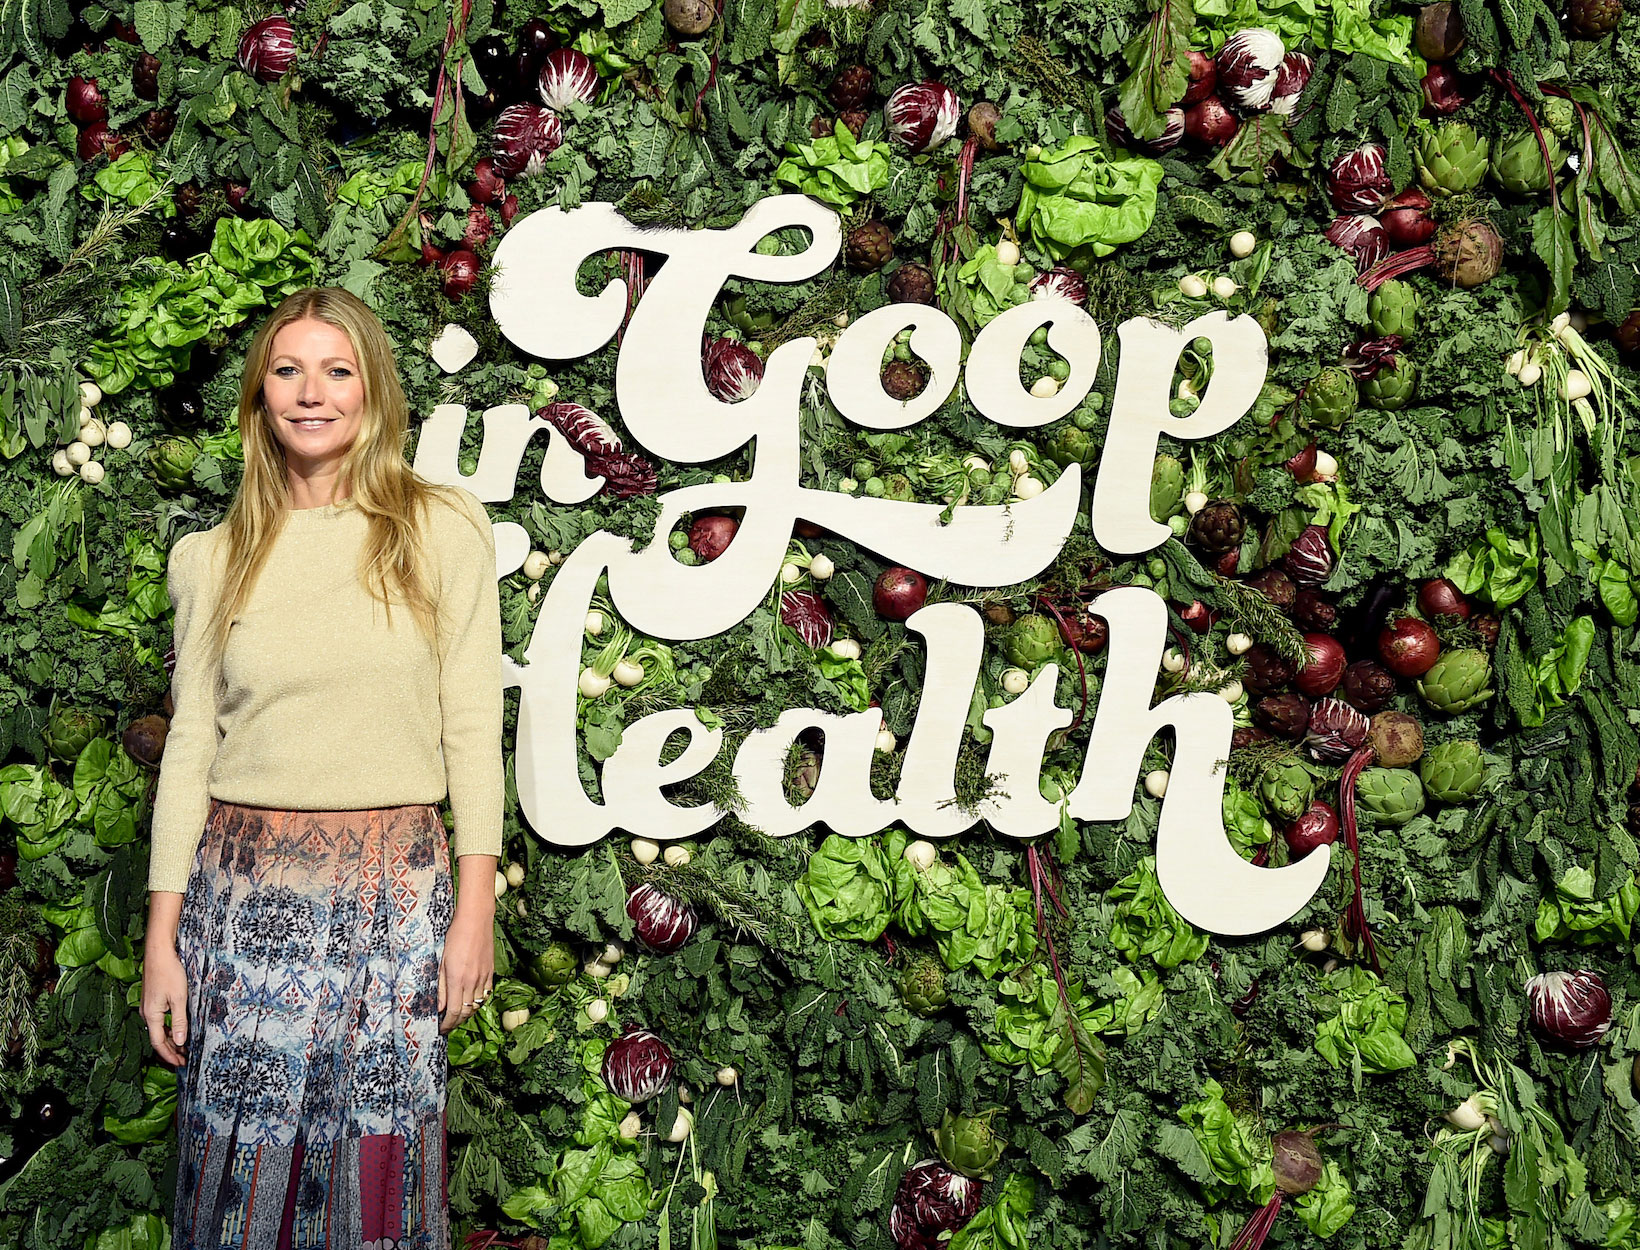 Megan Tries It: The goop Health Summit, at Home